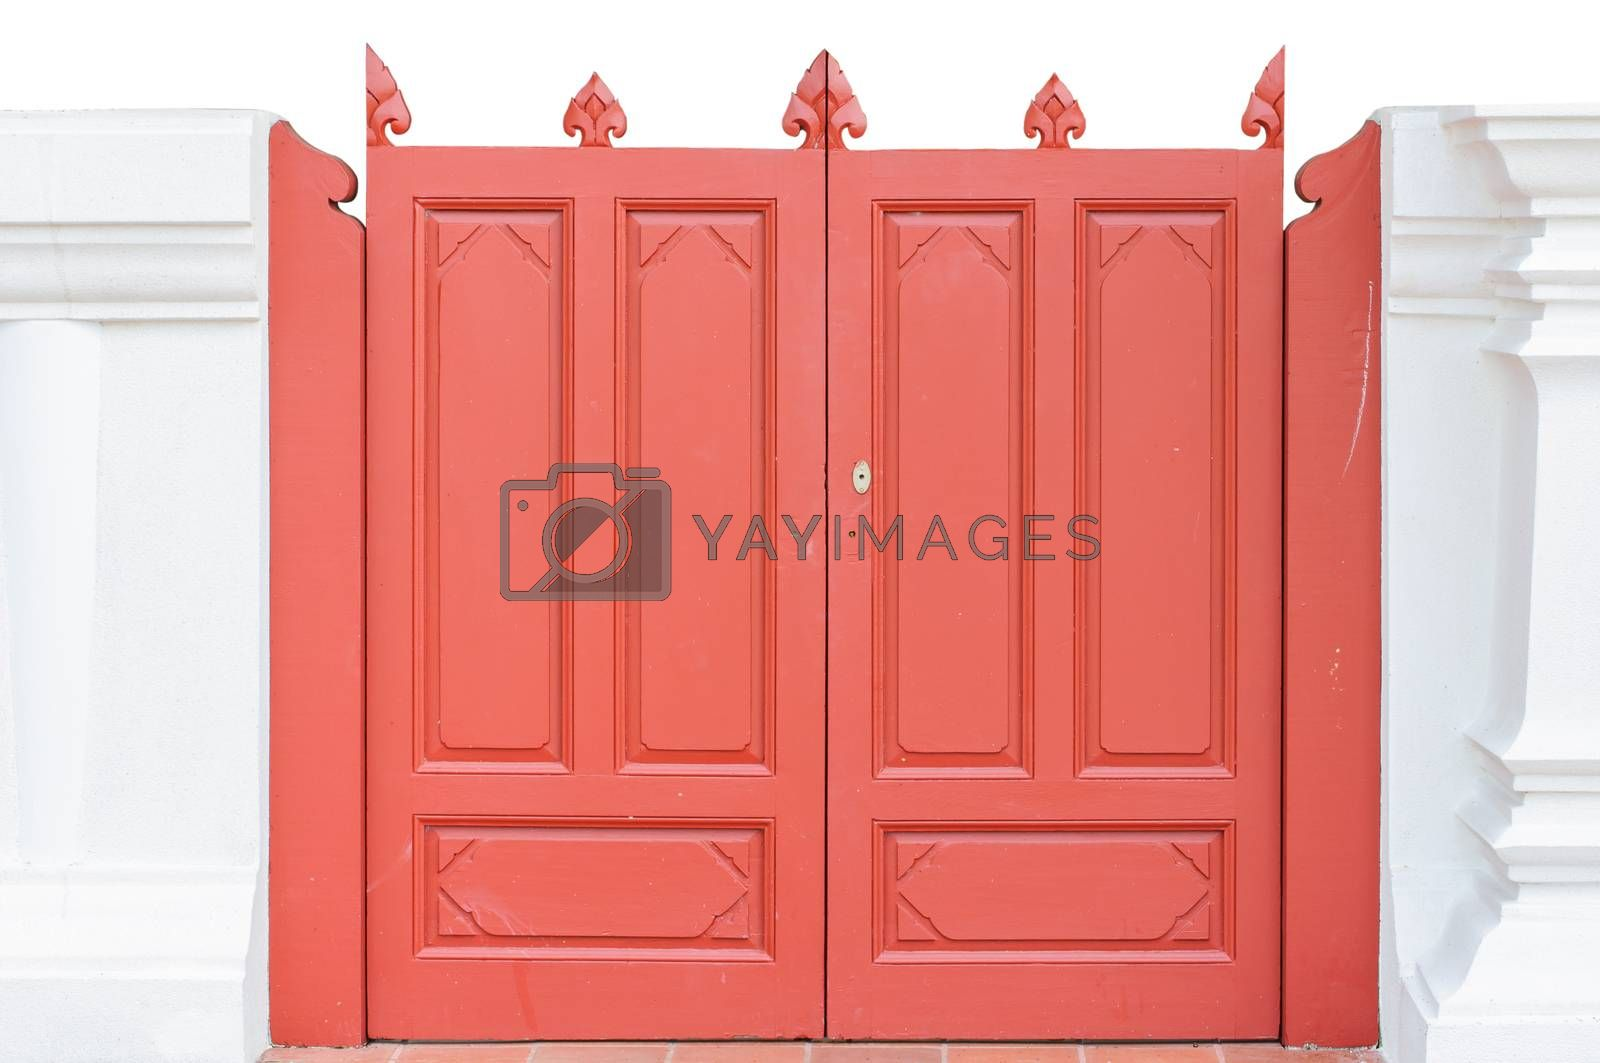 Royalty free image of Red the door by Sorapop